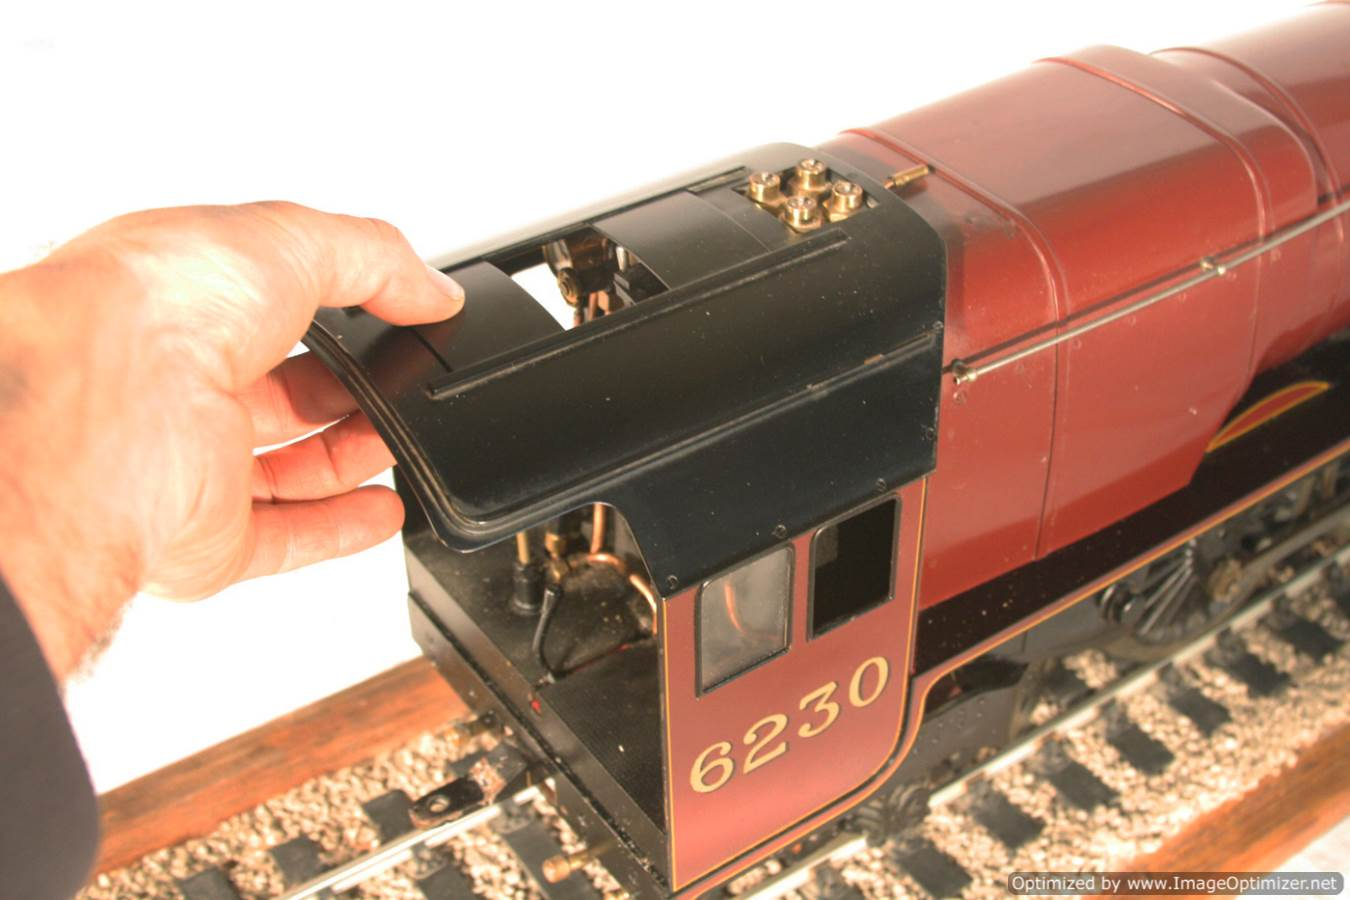 test 3 gauge LMS Stanier Duchess locomotive live steam model for sale 02-Optimized